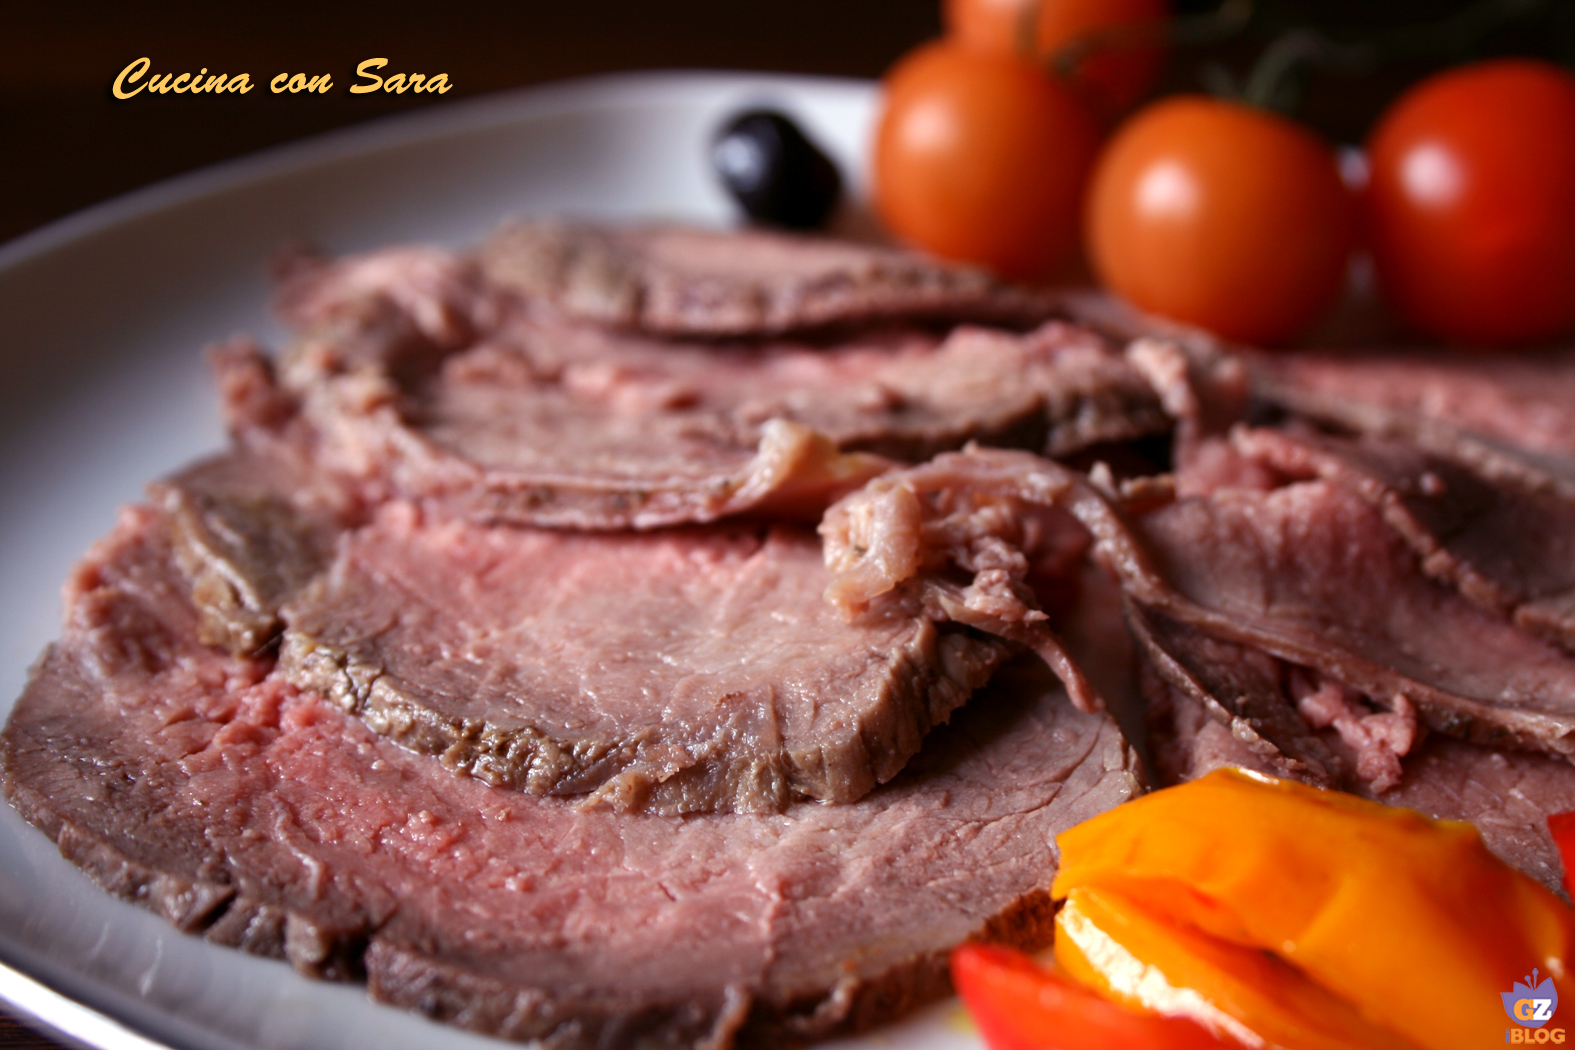 Roast beef all 39 inglese ricetta genuina cucina con sara - Cucina con sara ...